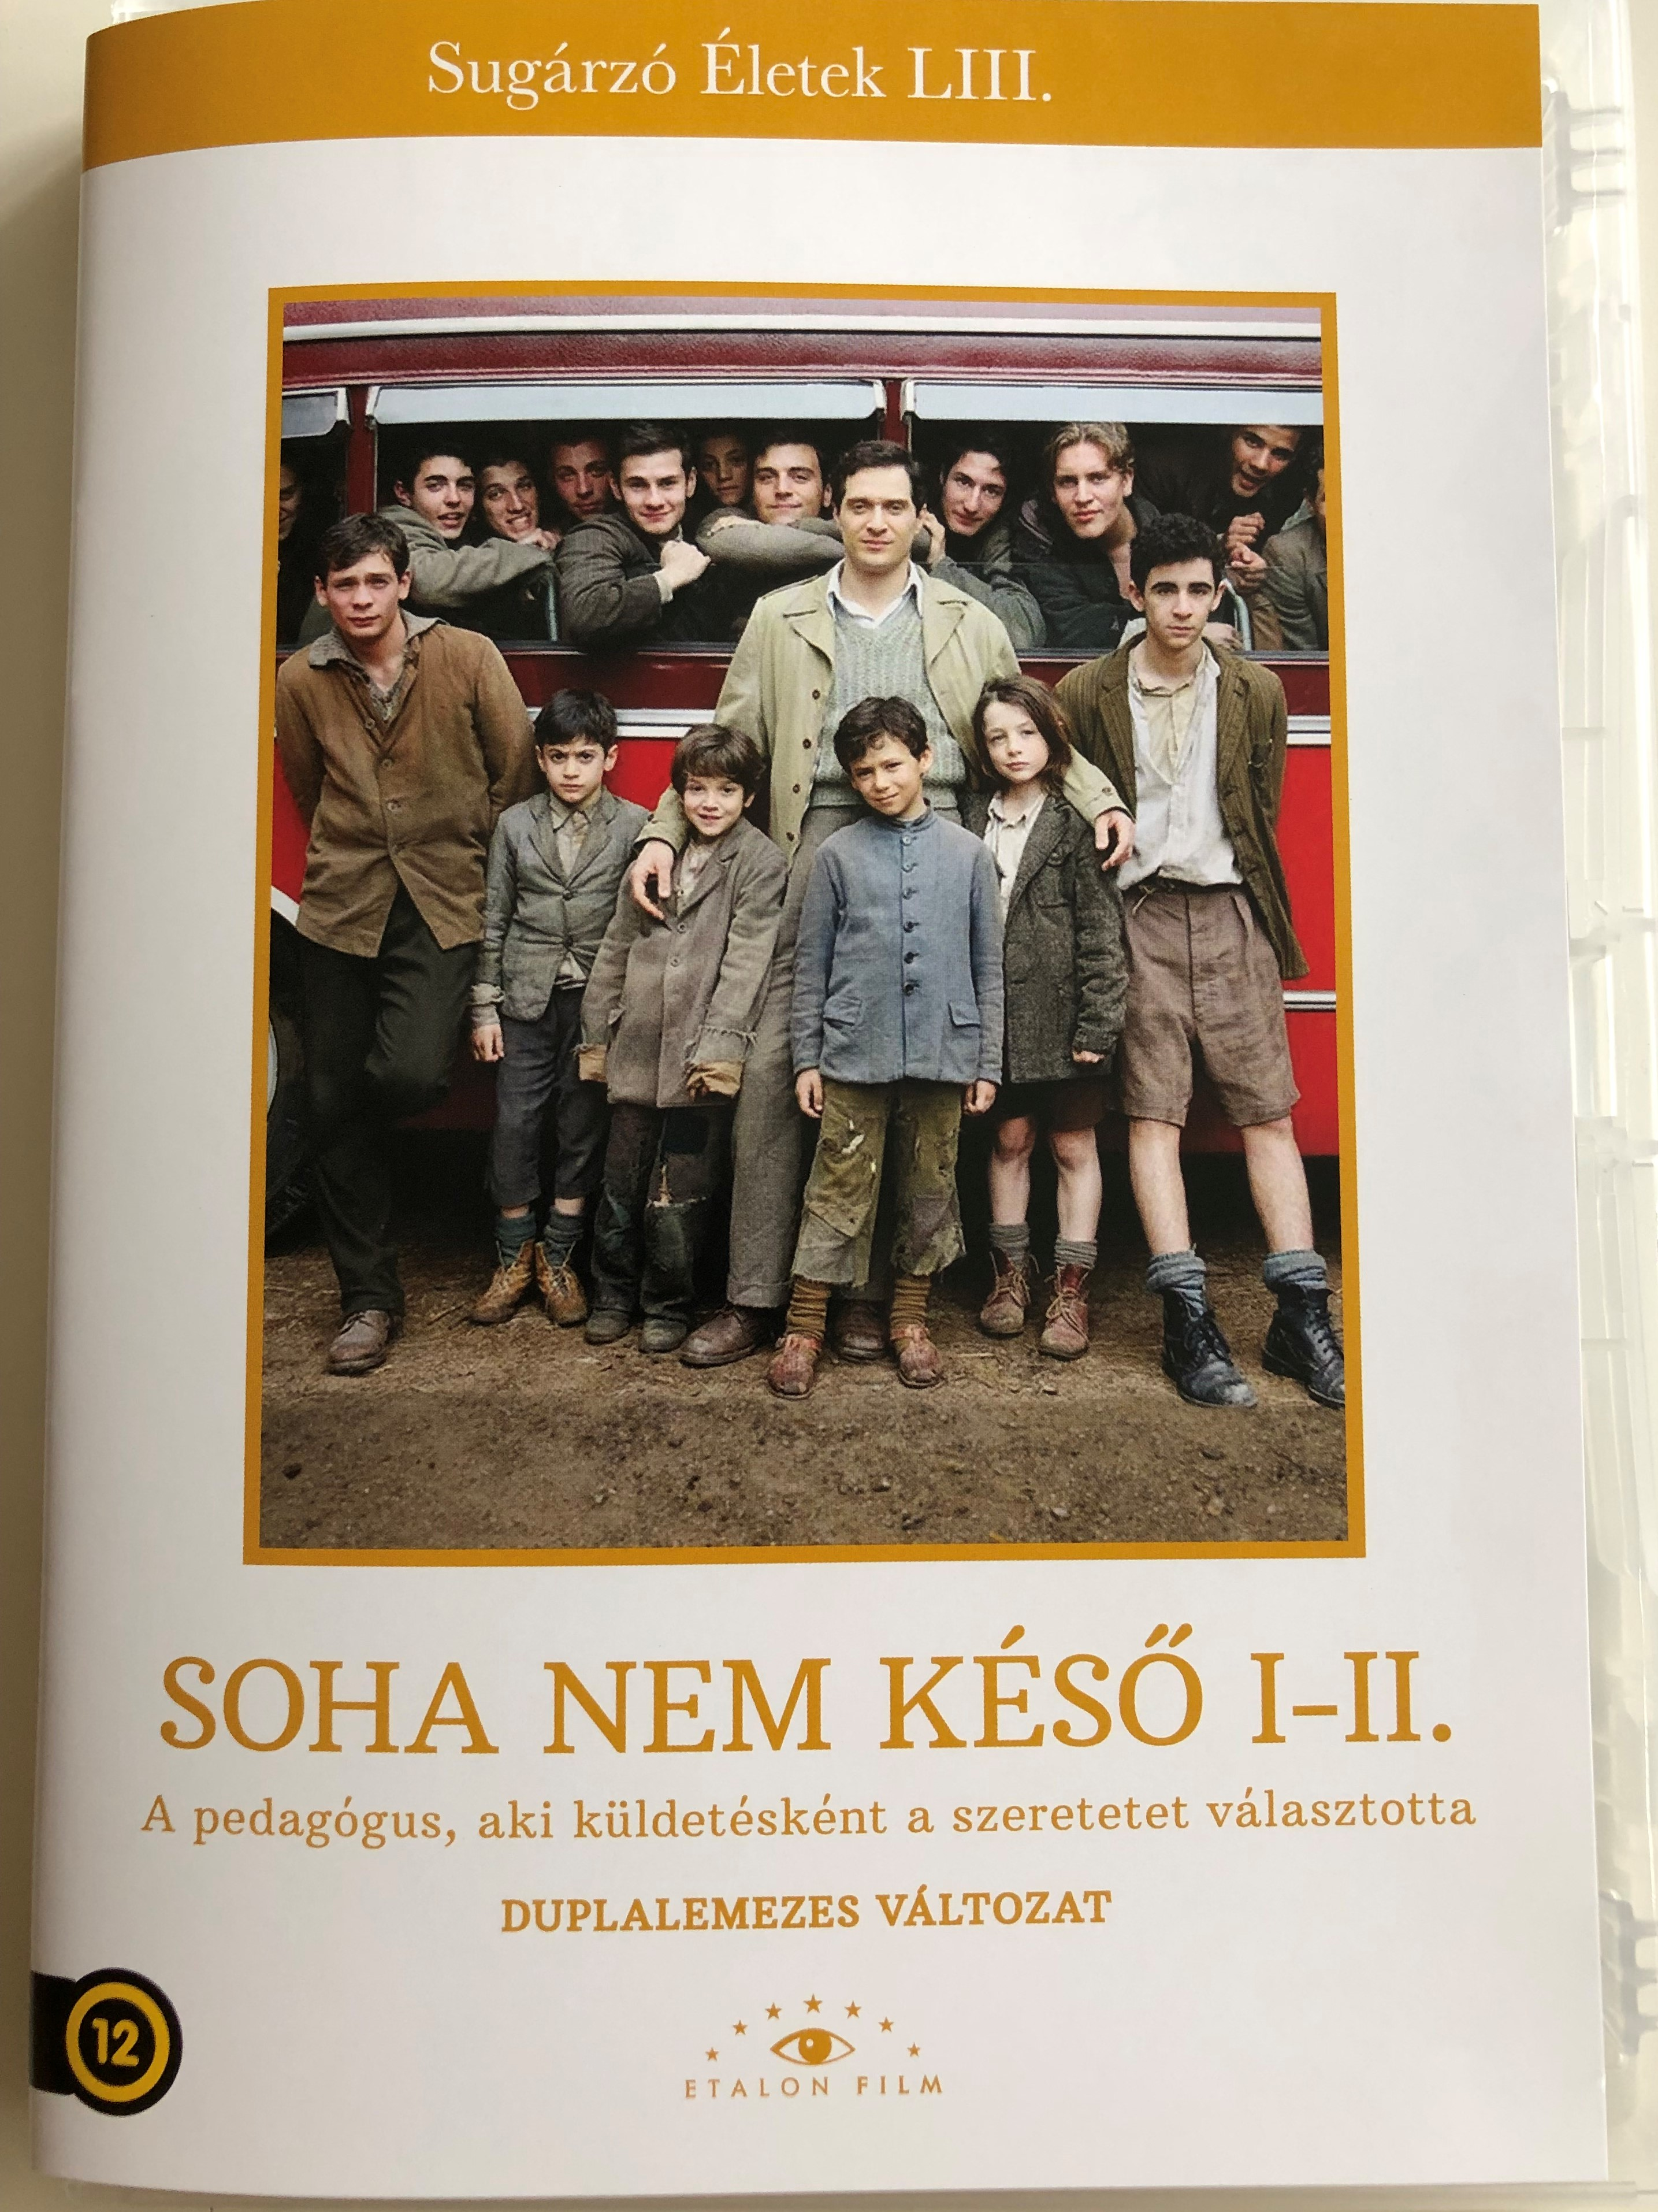 non-mai-troppo-tarti-i-ii.-dvd-2014-soha-nem-k-s-i-ii.-directed-by-giacomo-campiotti-starring-claudio-santamaria-nicole-grimaudo-gennaro-mirto-lucio-mscino-alberto-molinari-1-.jpg